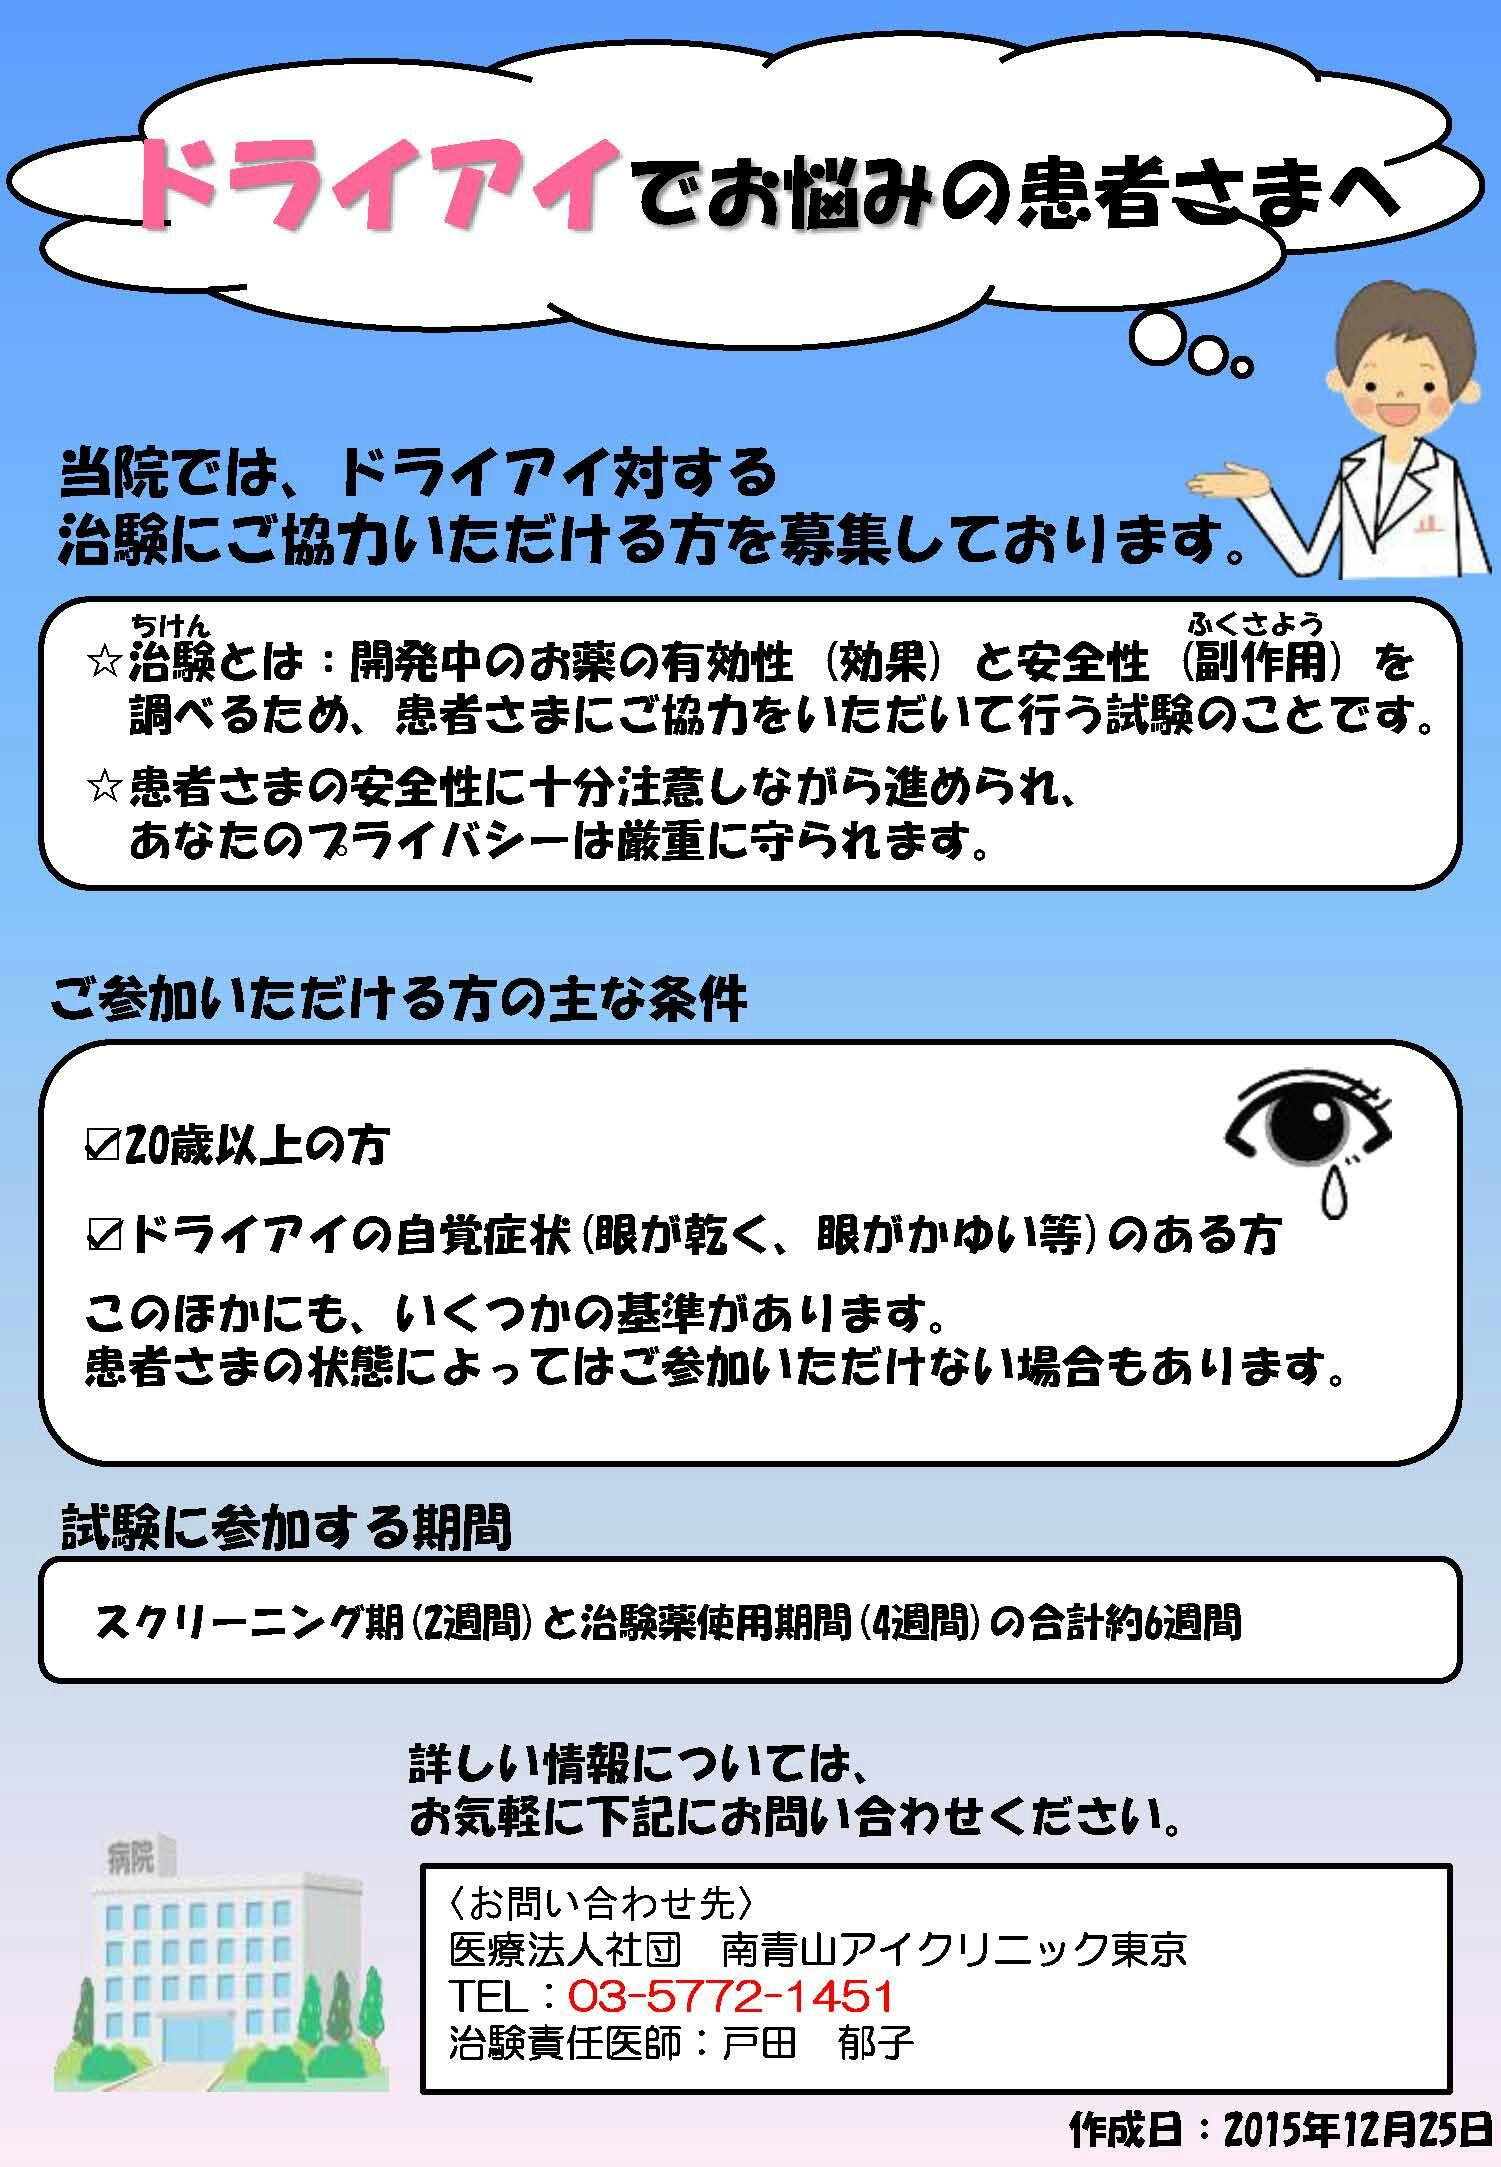 f:id:nanabox:20160927215909j:image